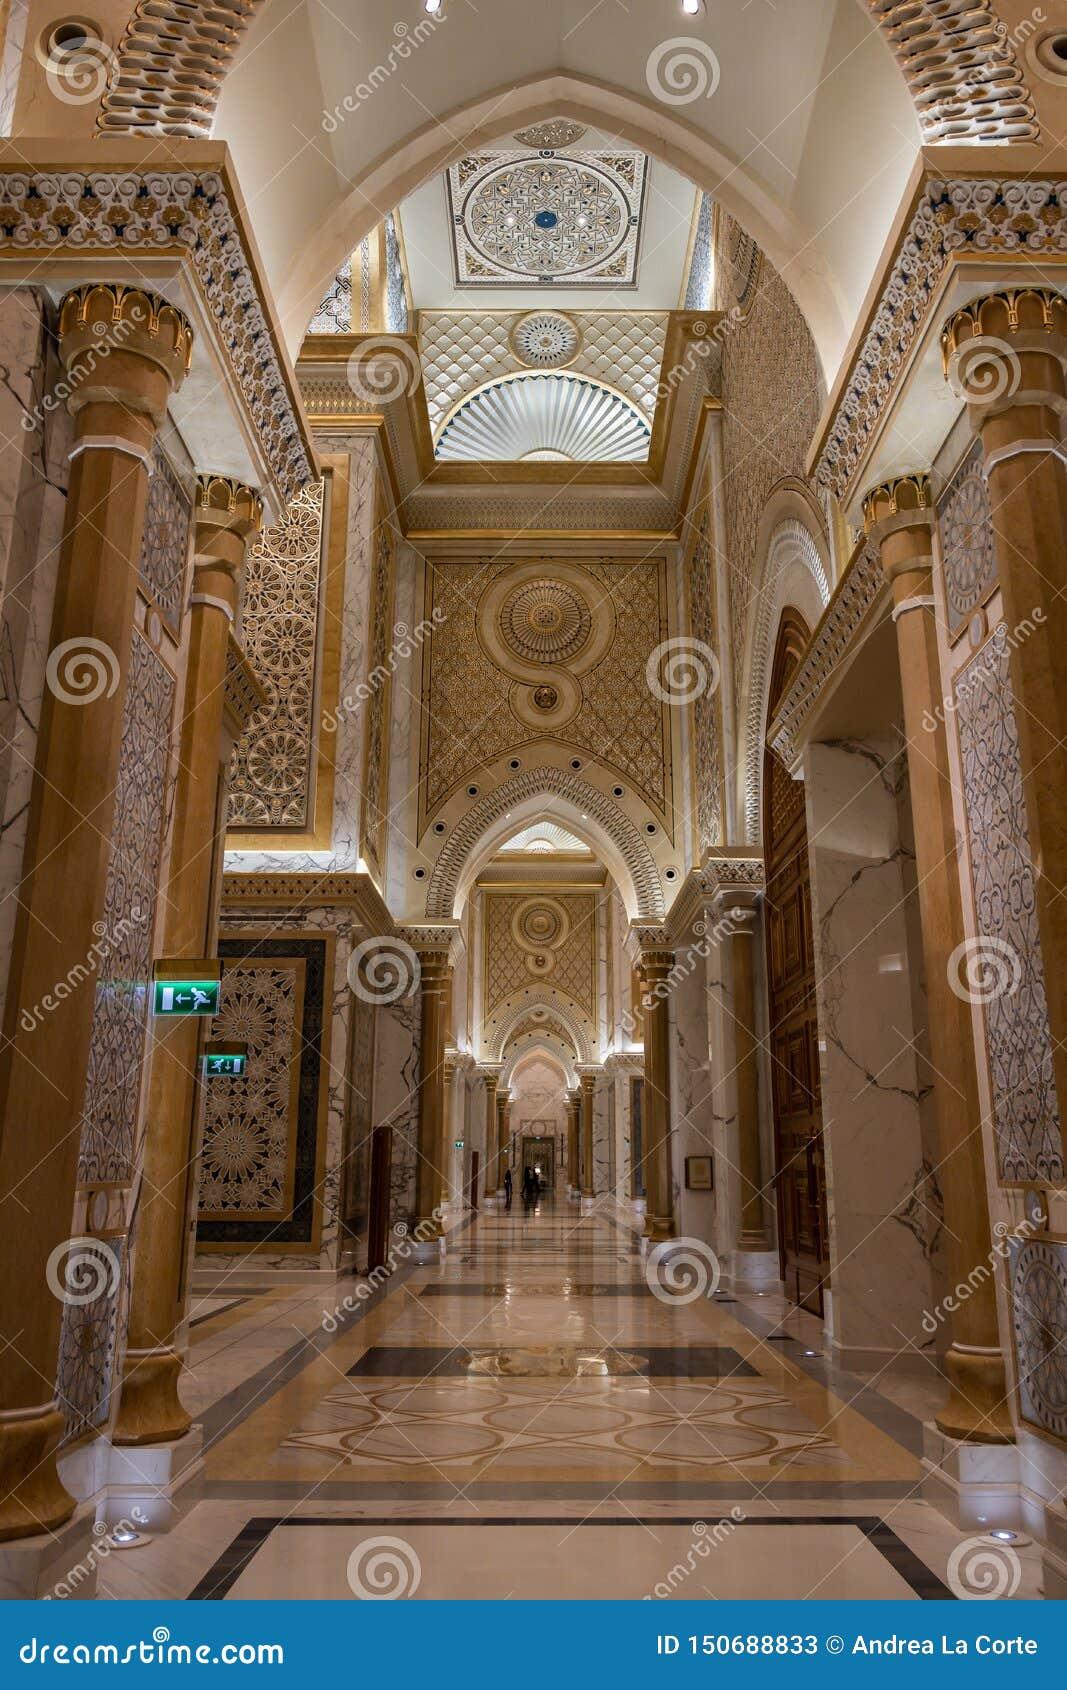 Qasr Al Watan, Palácio Presidencial dos Emirados Árabes Unidos, Abu Dhabi